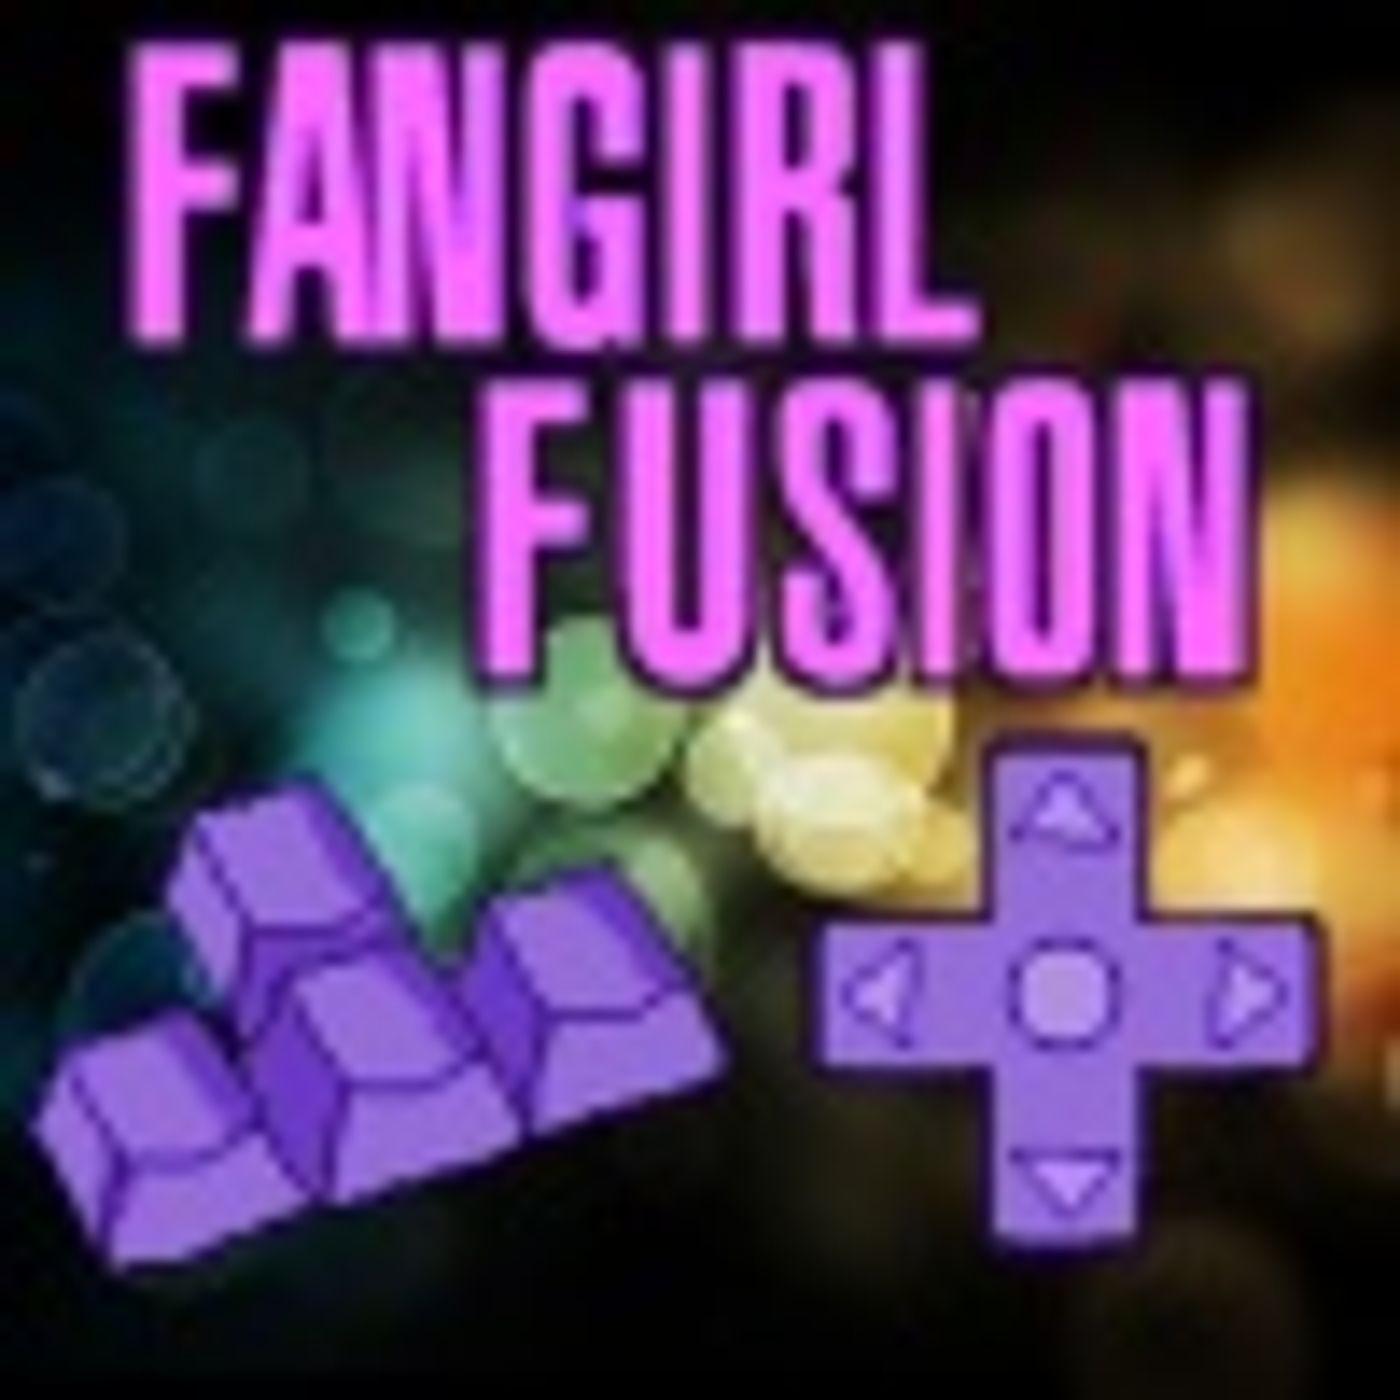 Fangirl Fusion